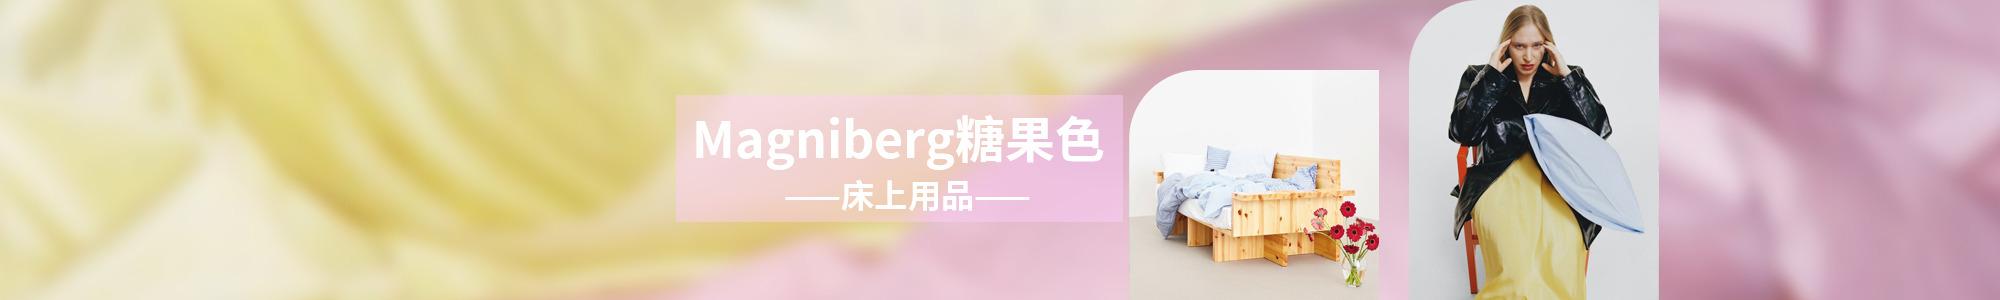 Magniberg糖果色瑞士